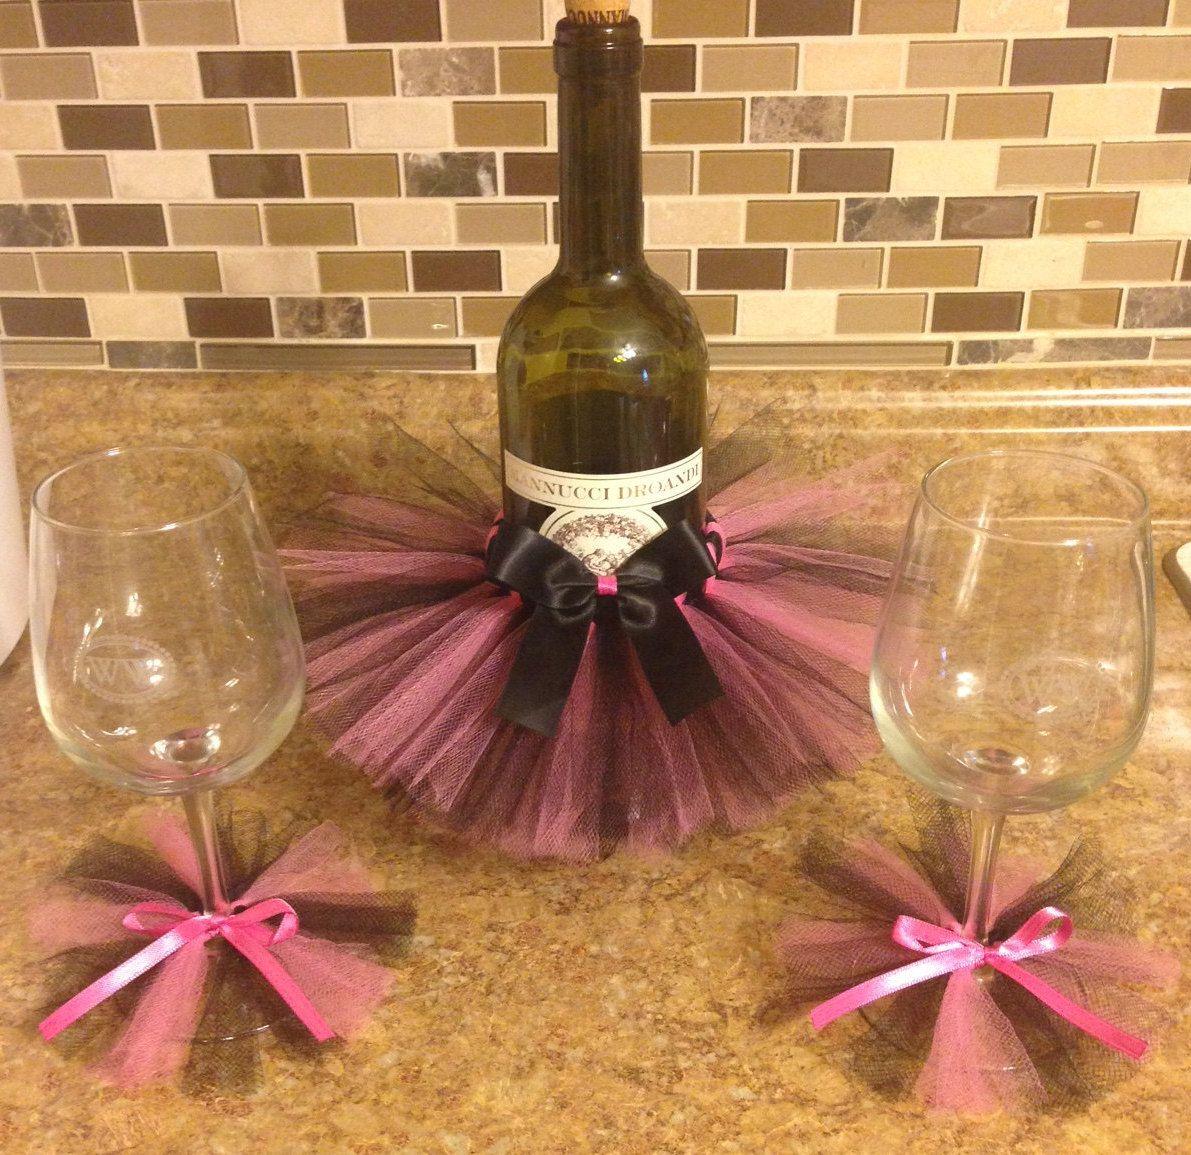 458dec8c09 Pink and black wine bottle tutu & 2 wine glass tutus bachelorette party  shower centerpiece by MmmSparkle on Etsy